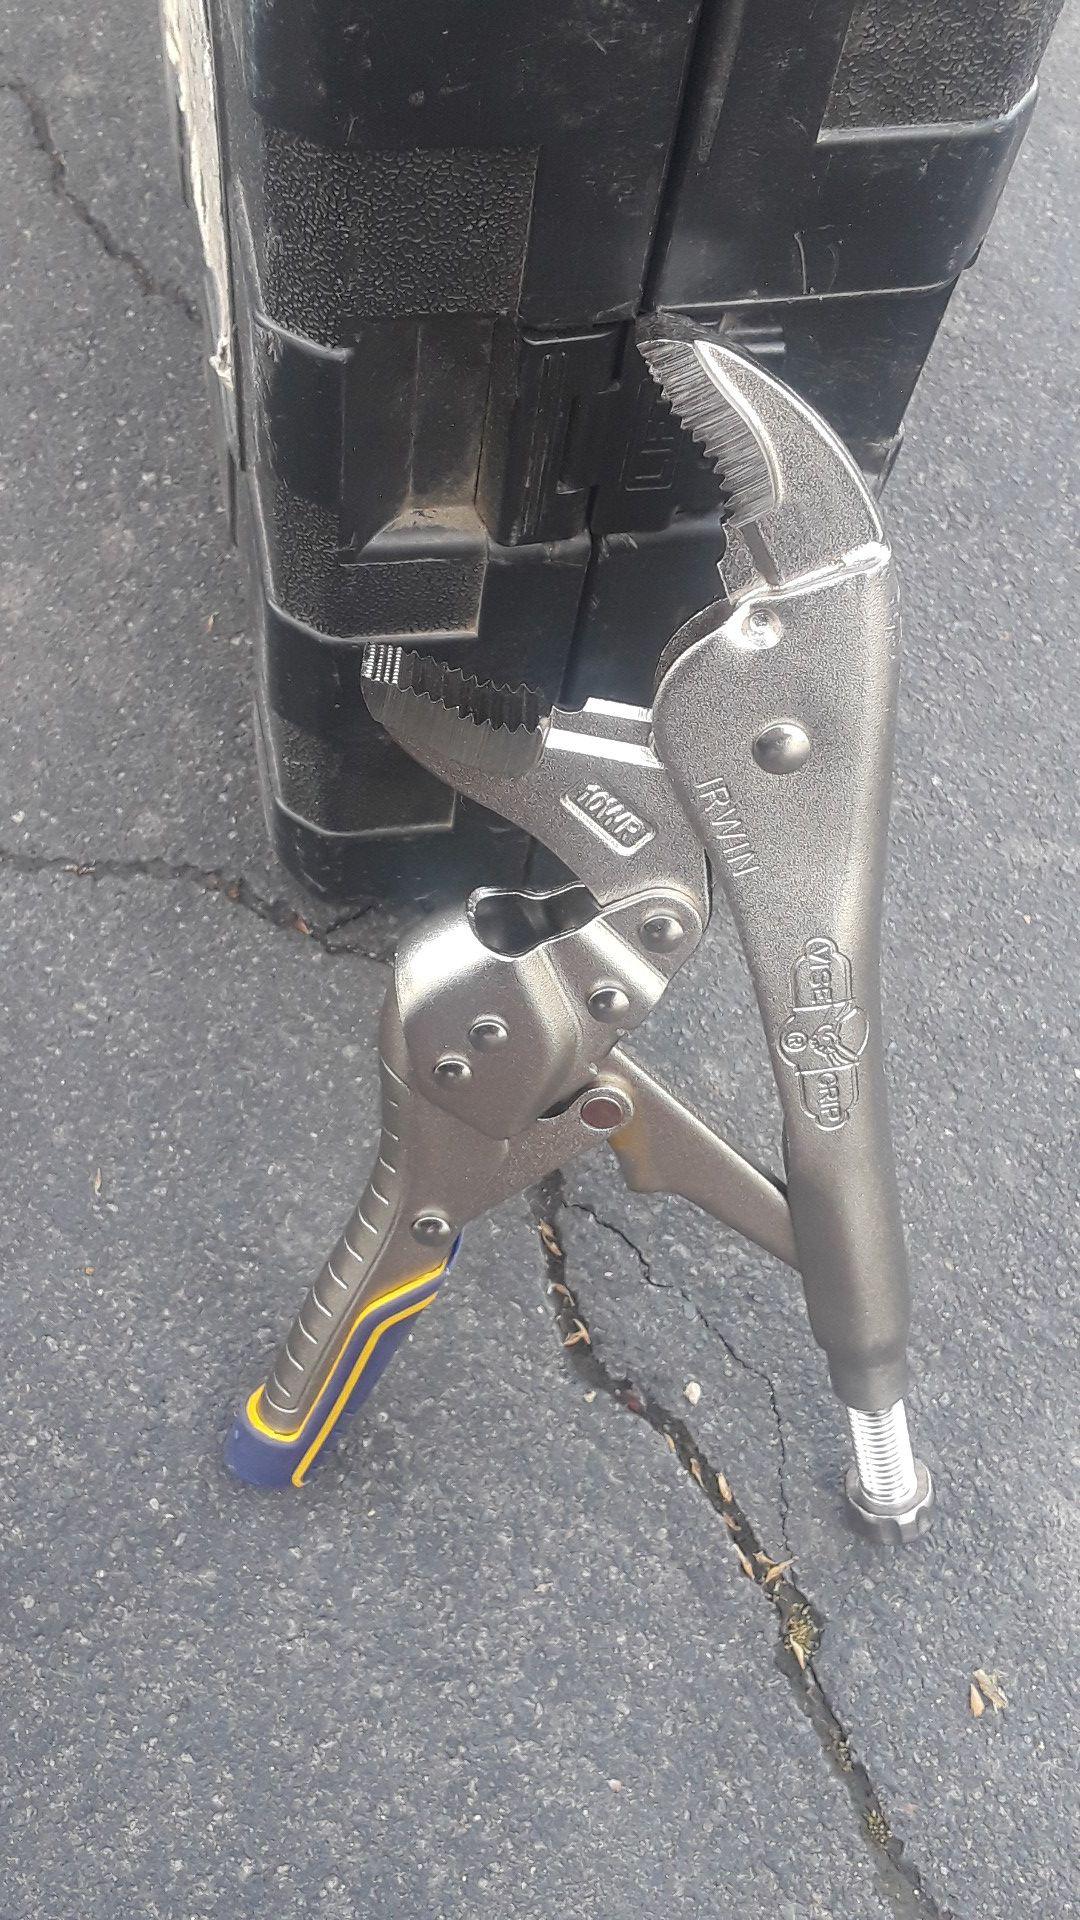 The original vise-grip locking Plier